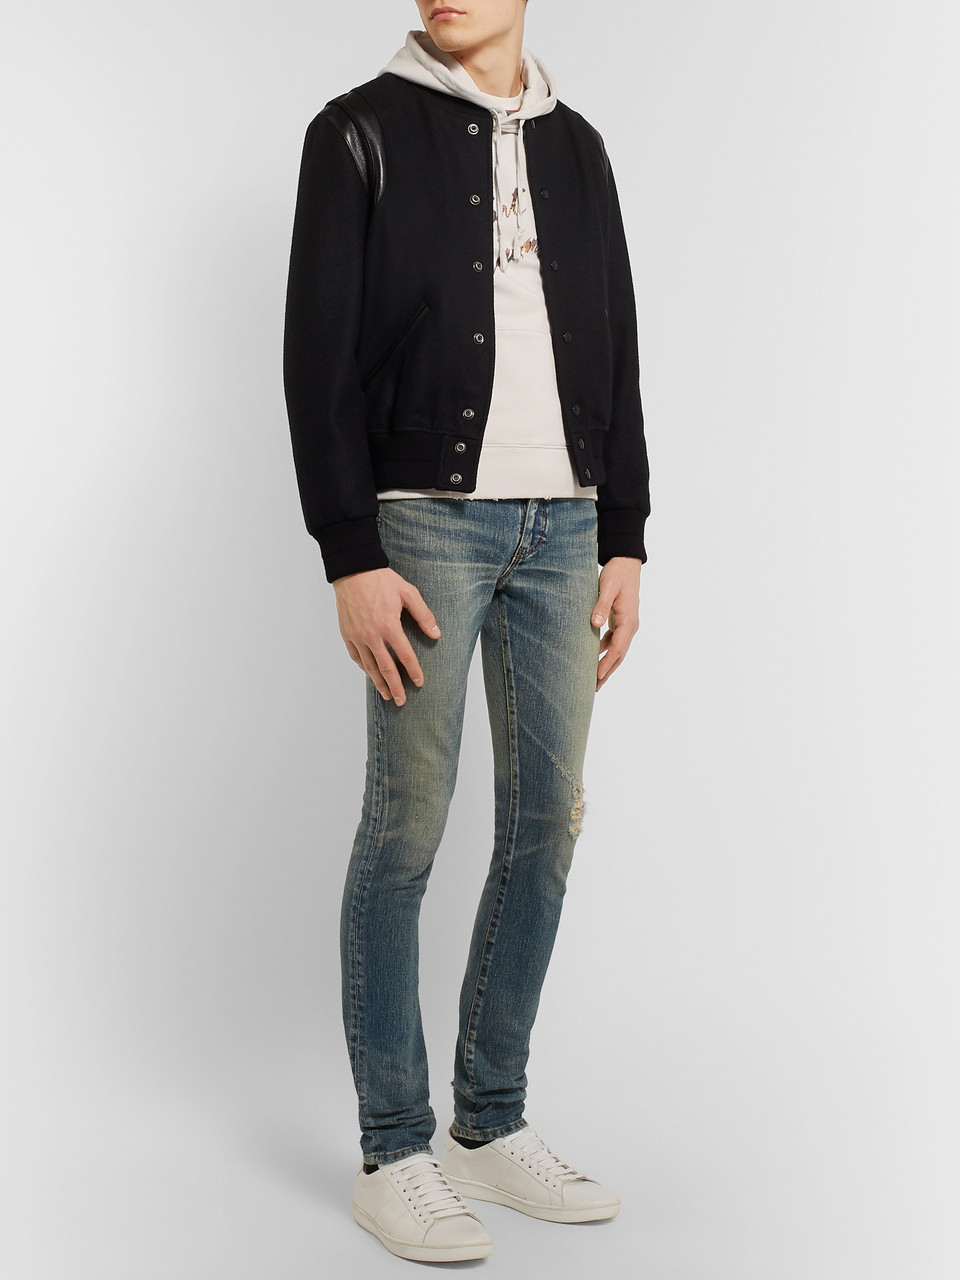 5149551b657 Off-white Logo-Print Loopback Cotton-Jersey Hoodie | SAINT LAURENT ...